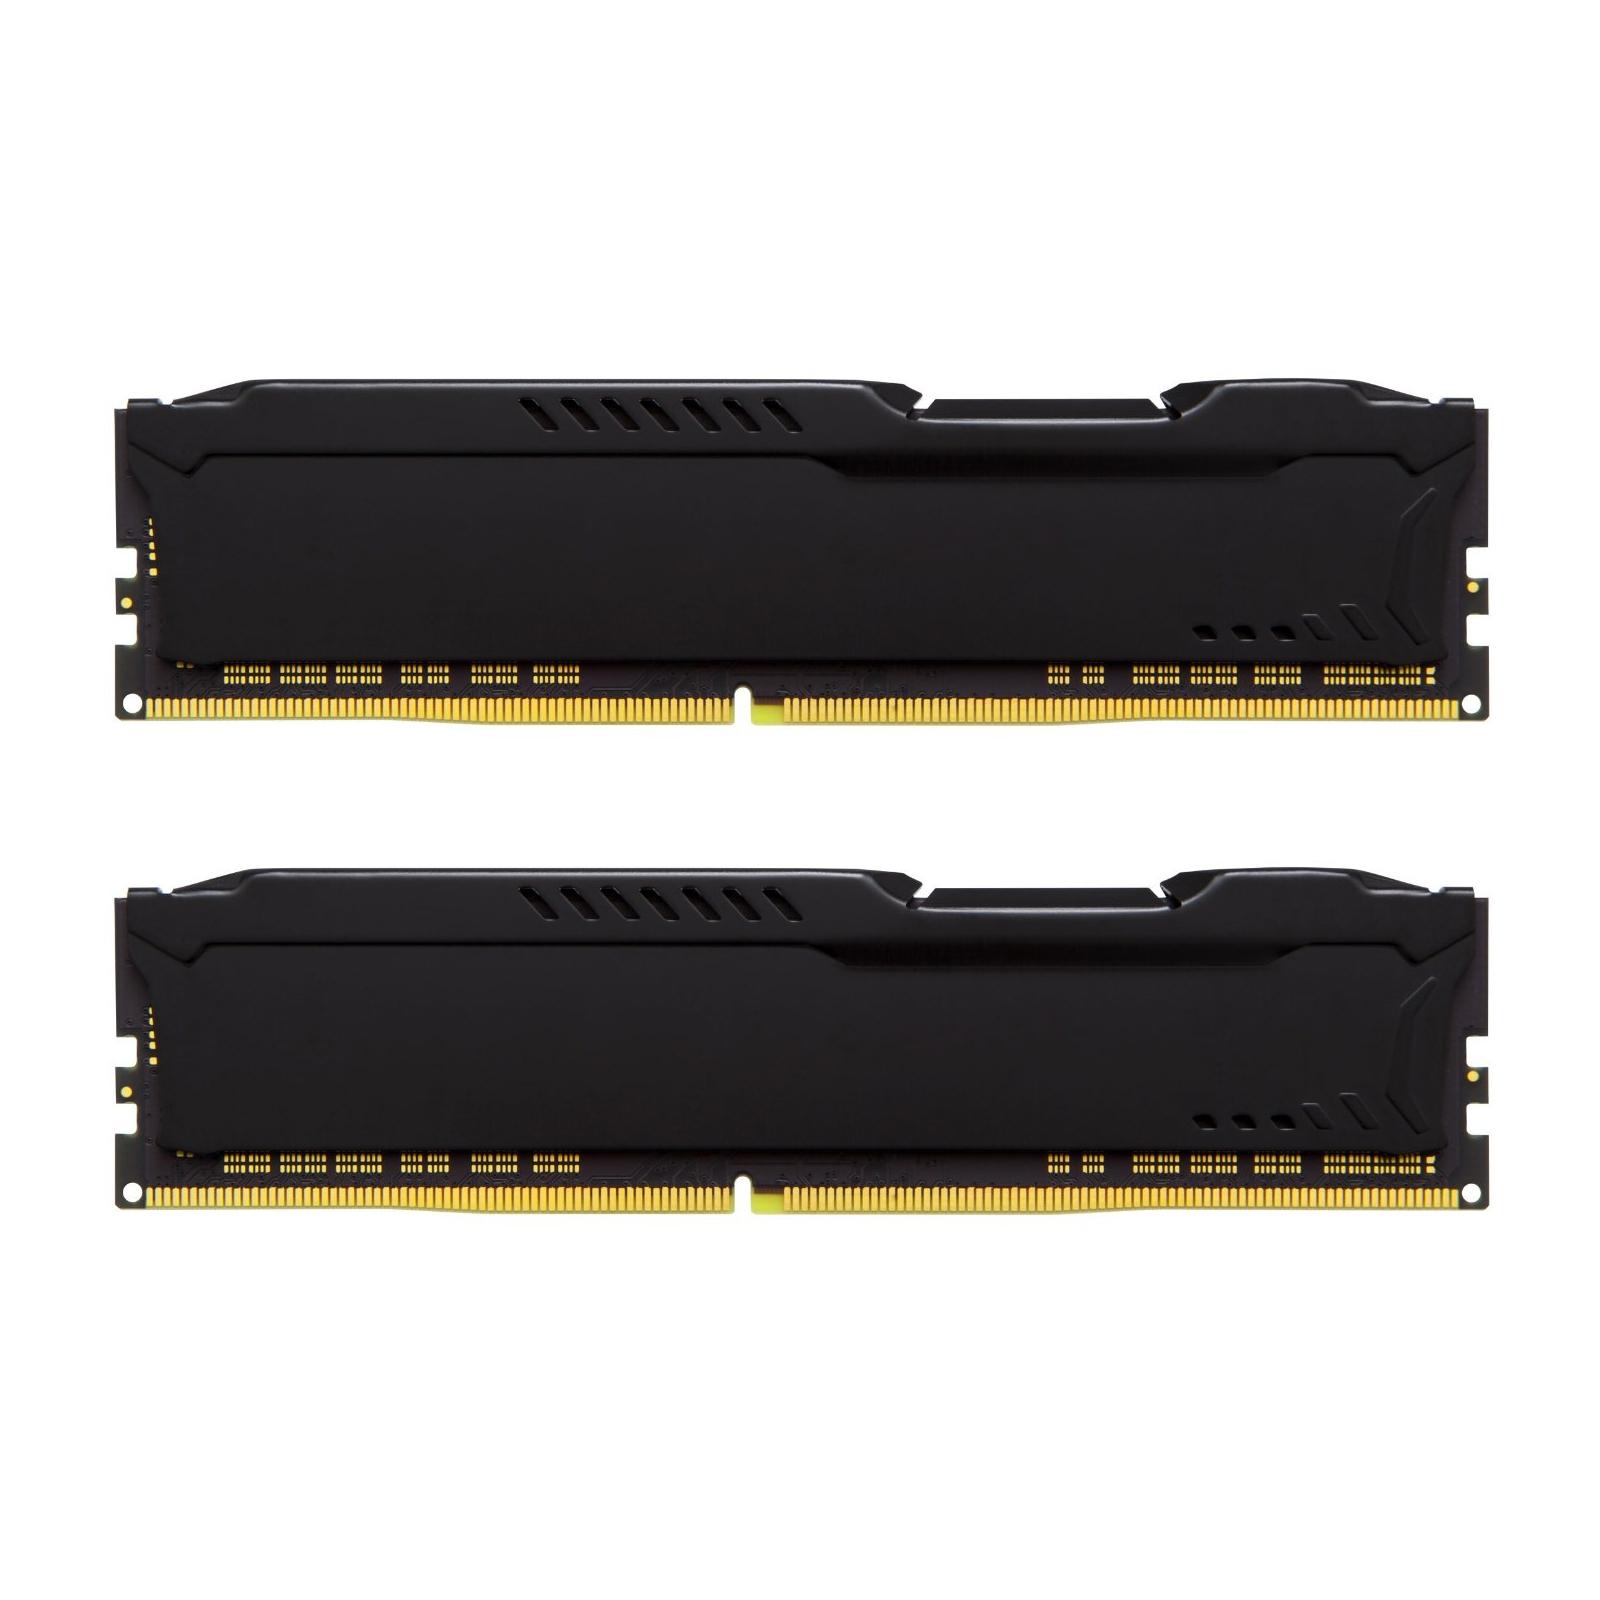 Модуль памяти для компьютера DDR4 32GB (2x16GB) 2133 MHz HyperX FURY Black Kingston (HX421C14FBK2/32) изображение 3